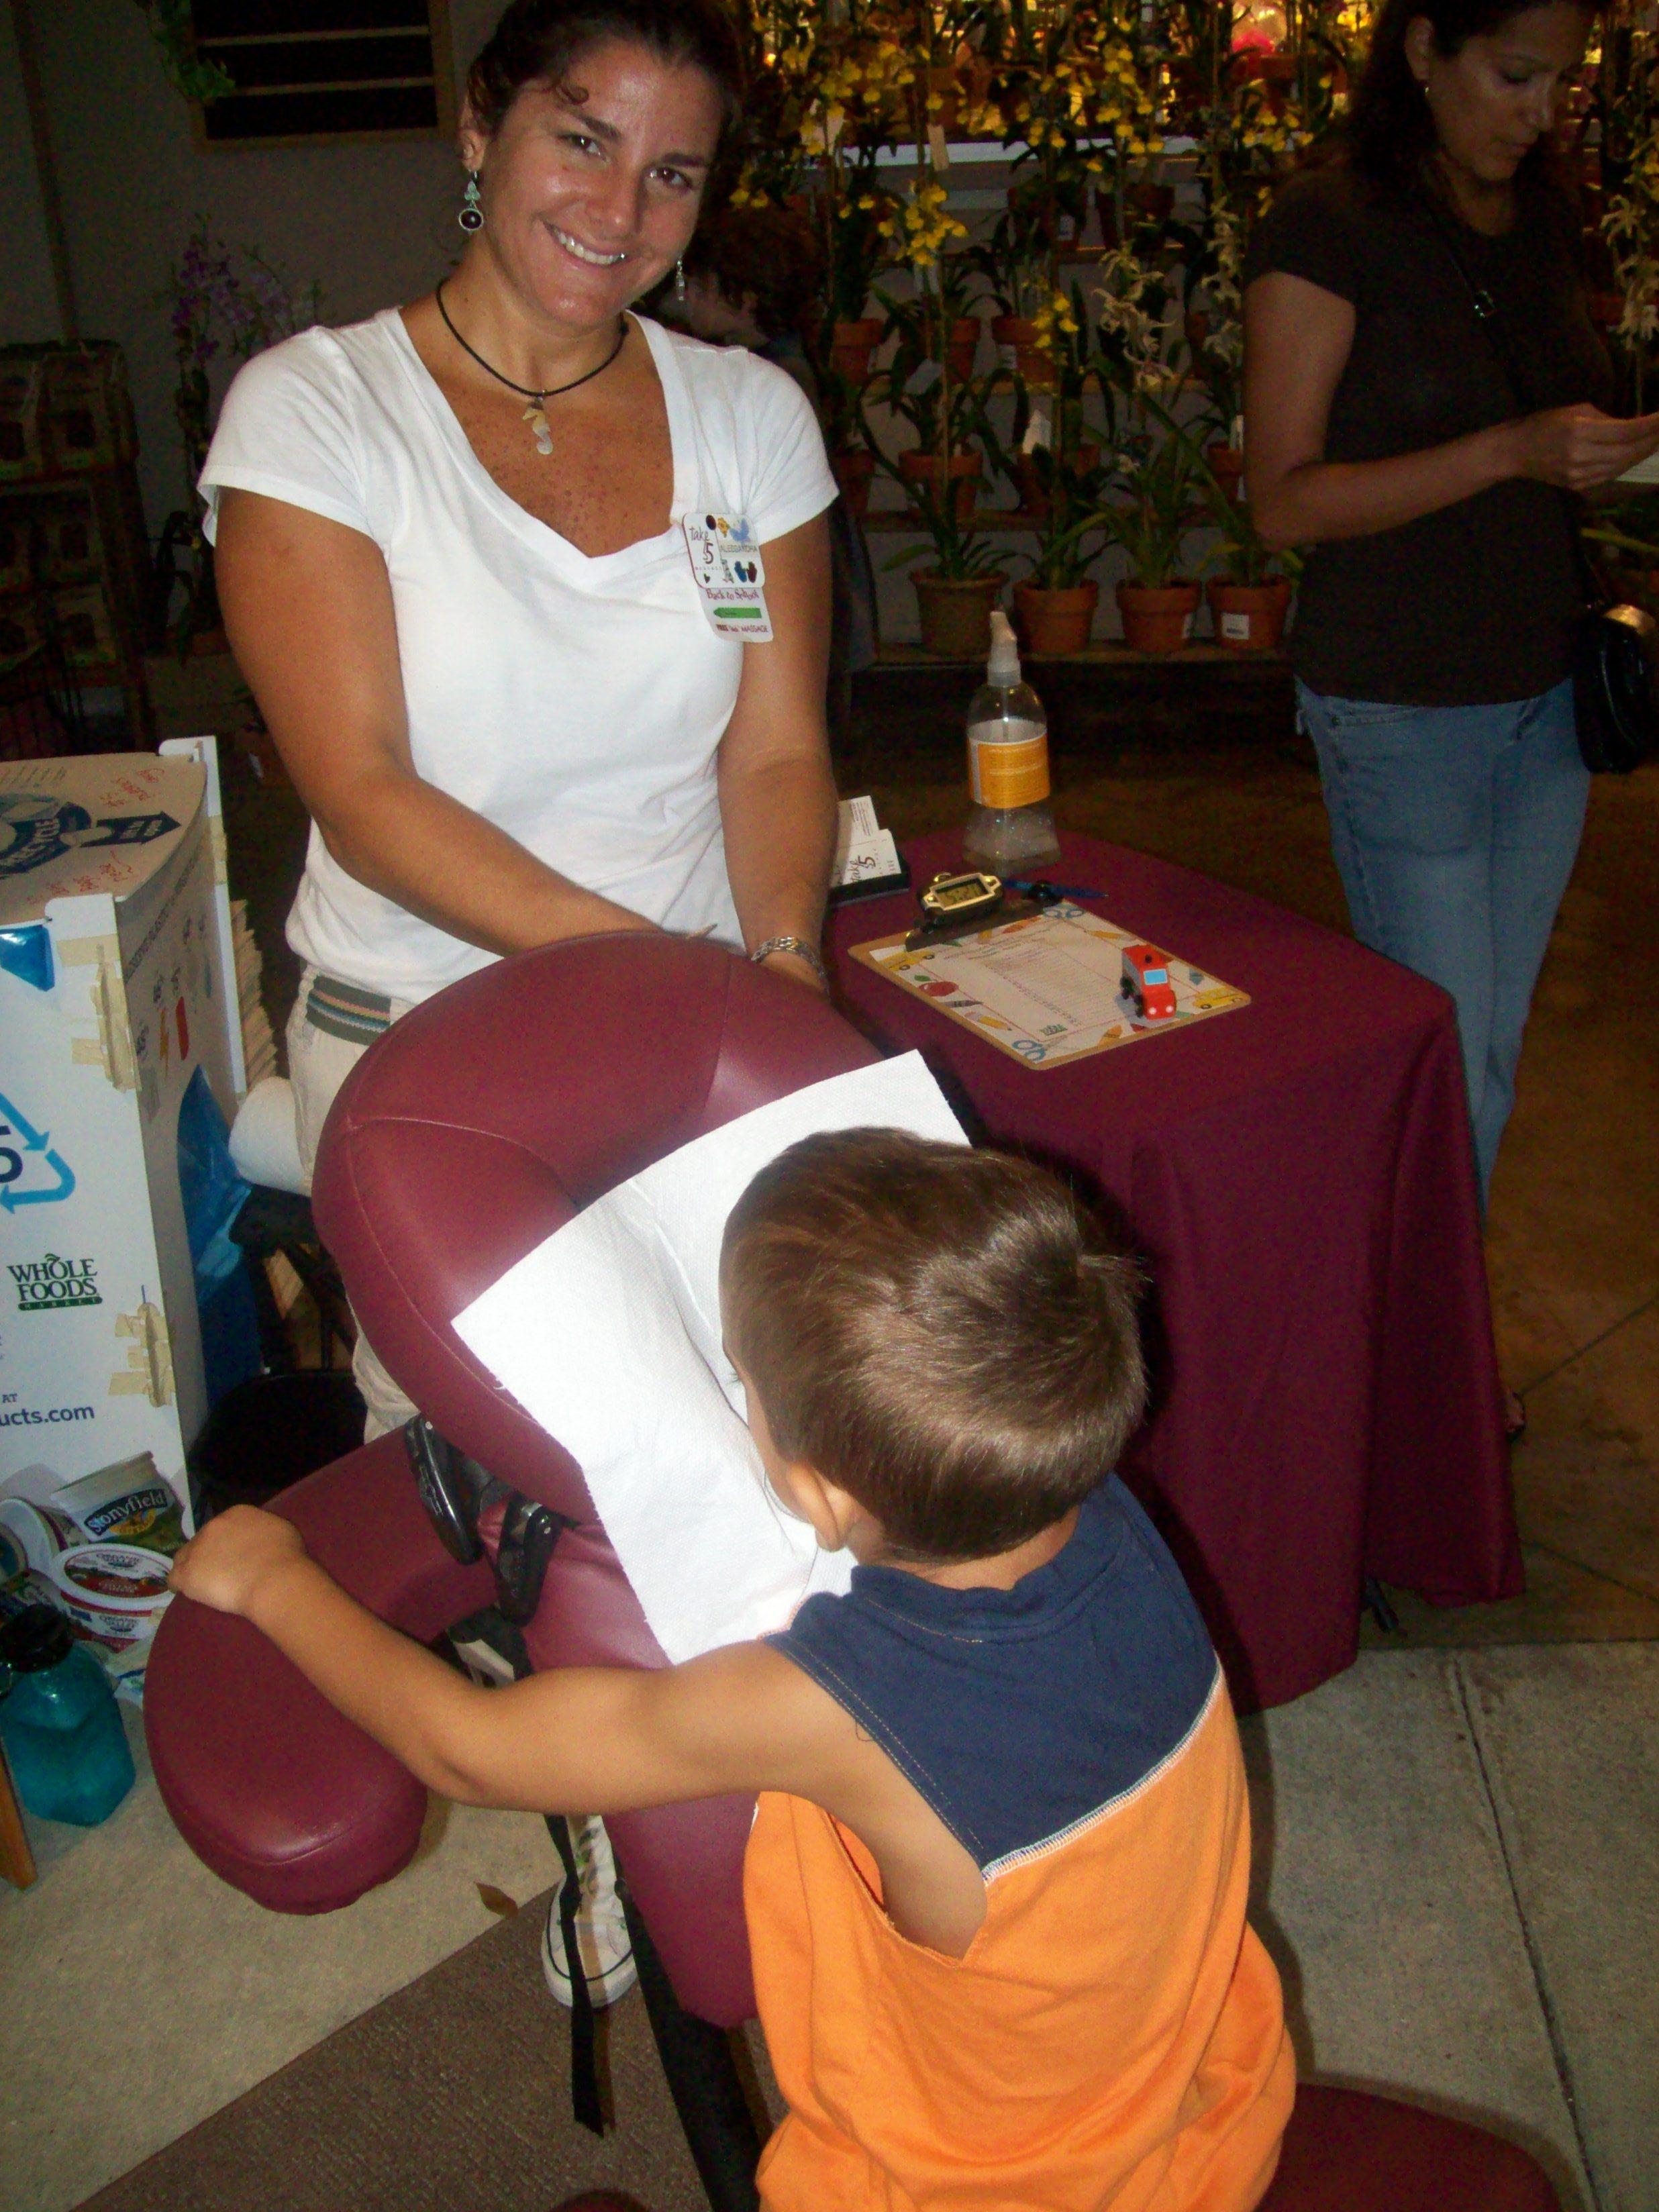 2010-08-wp-alex-child-in-chair